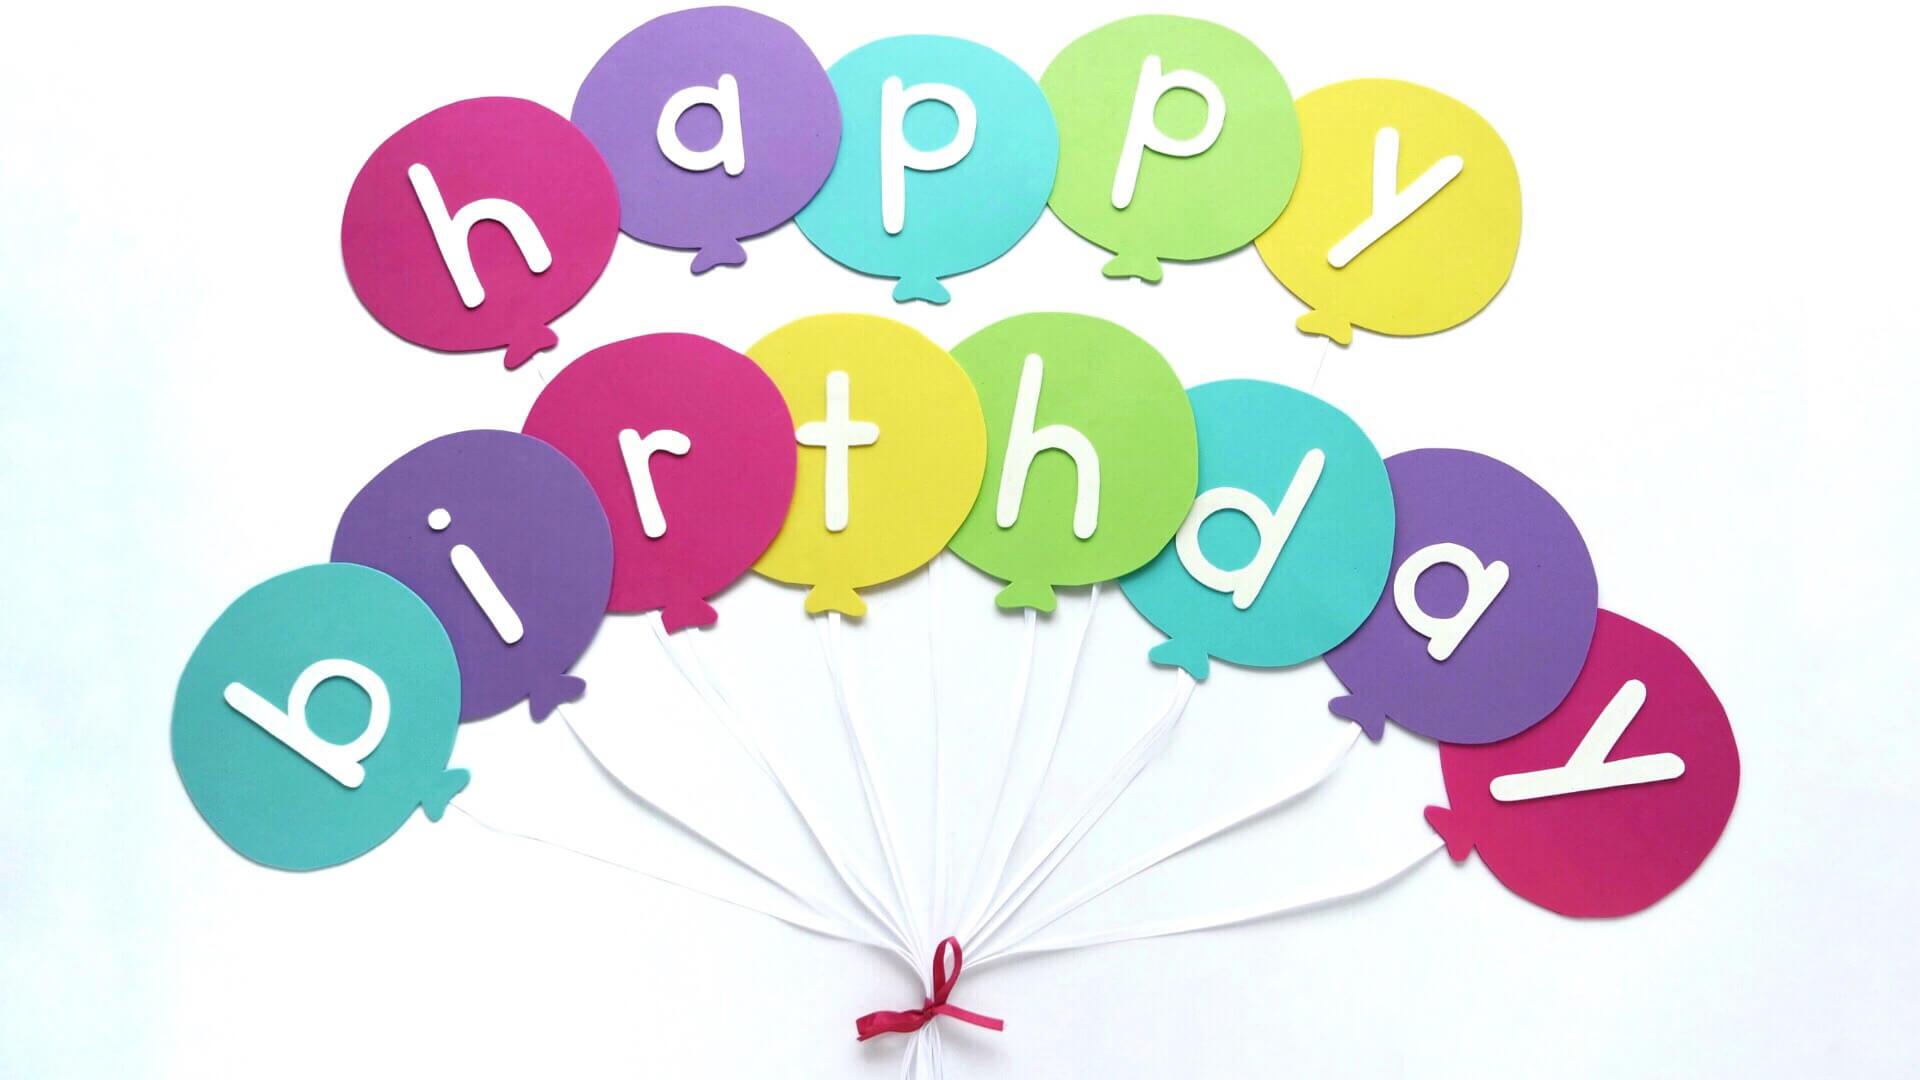 Happy Birthday Banner Diy Template | Balloon Birthday Banner Regarding Free Happy Birthday Banner Templates Download